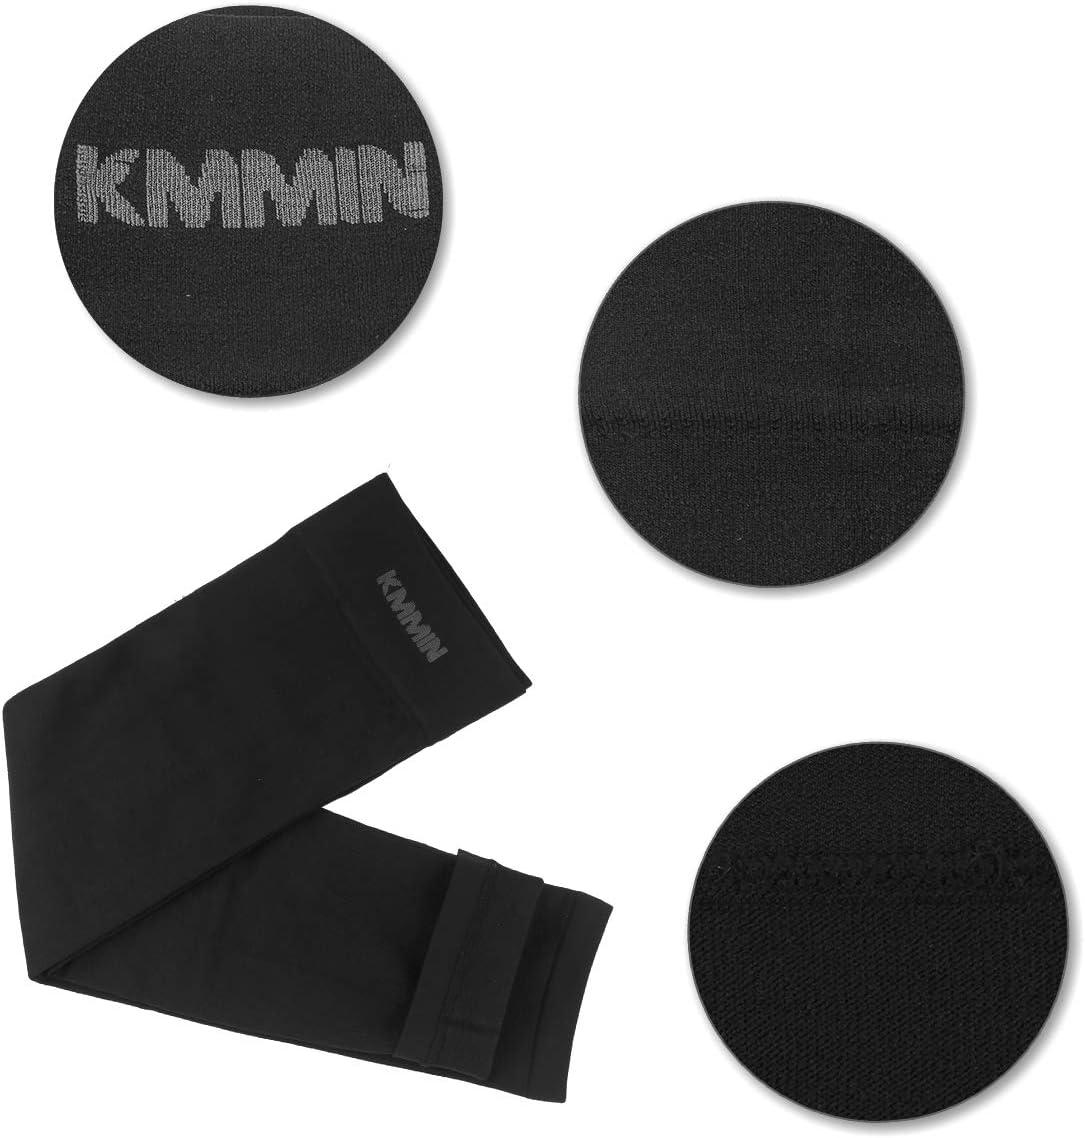 KMMIN Mangas de Brazo, Unisex Warmer UV Protección Mangas para ...